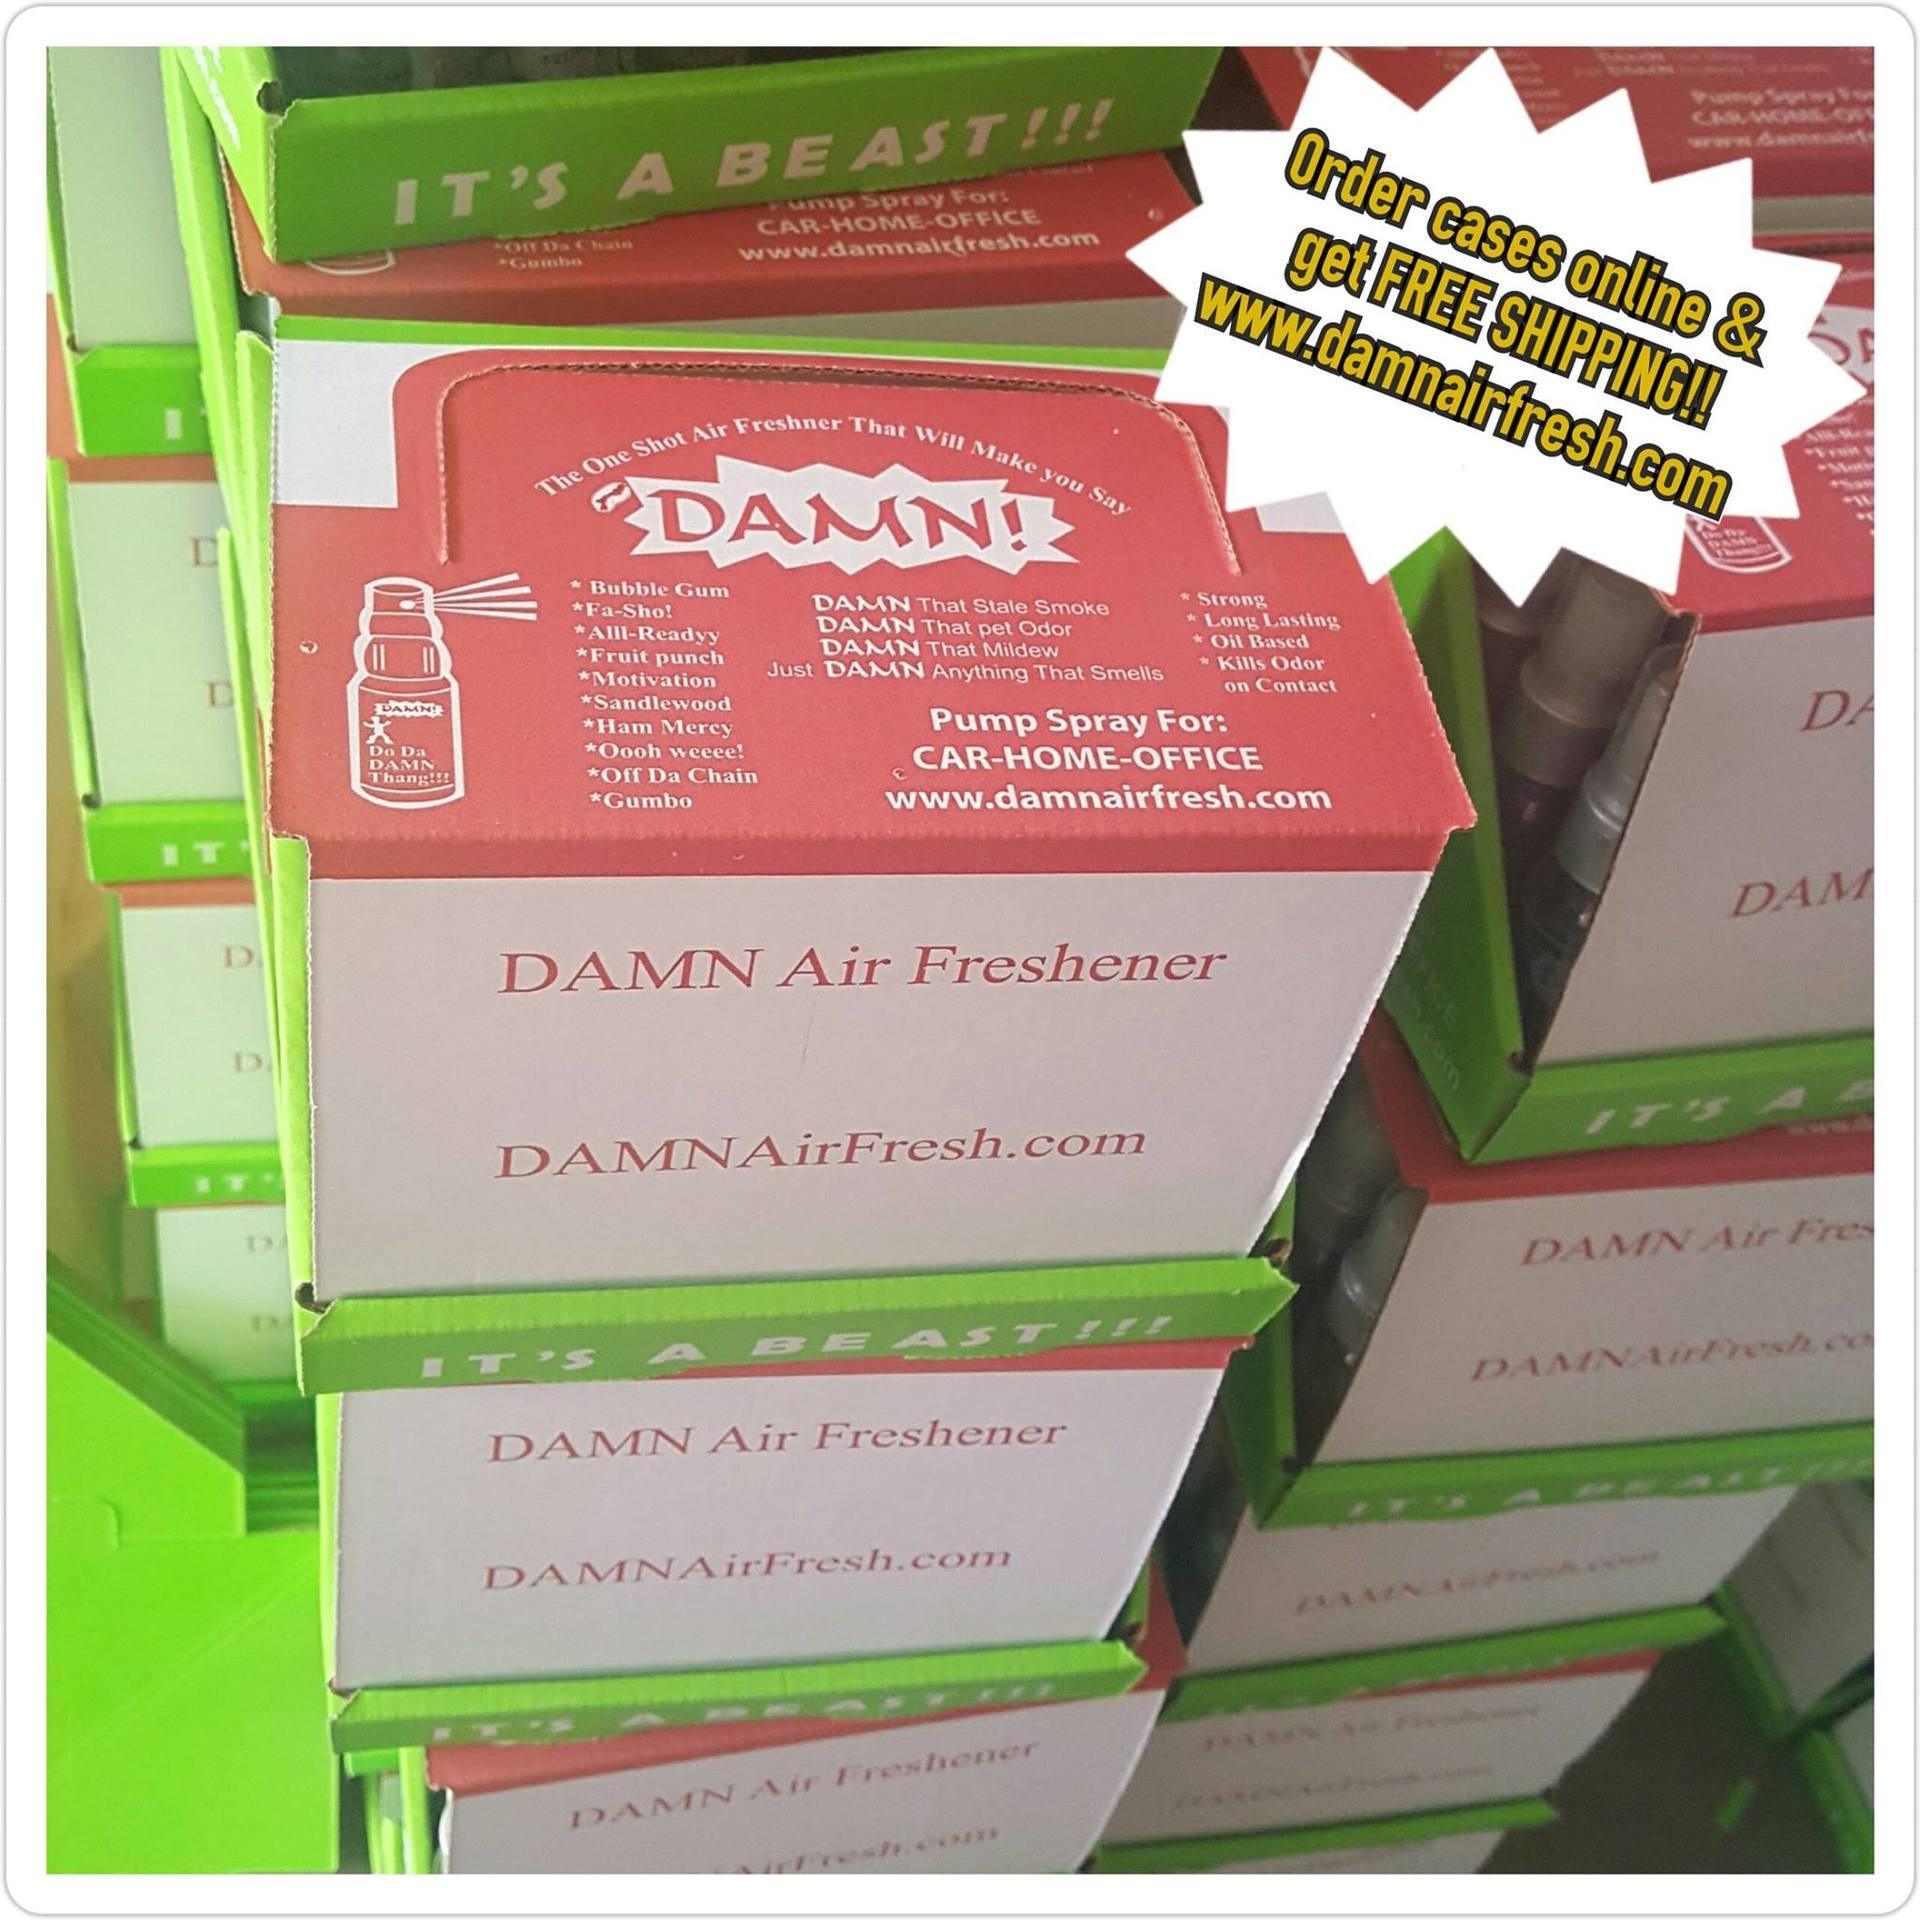 Damn Air Freshener 24 pack